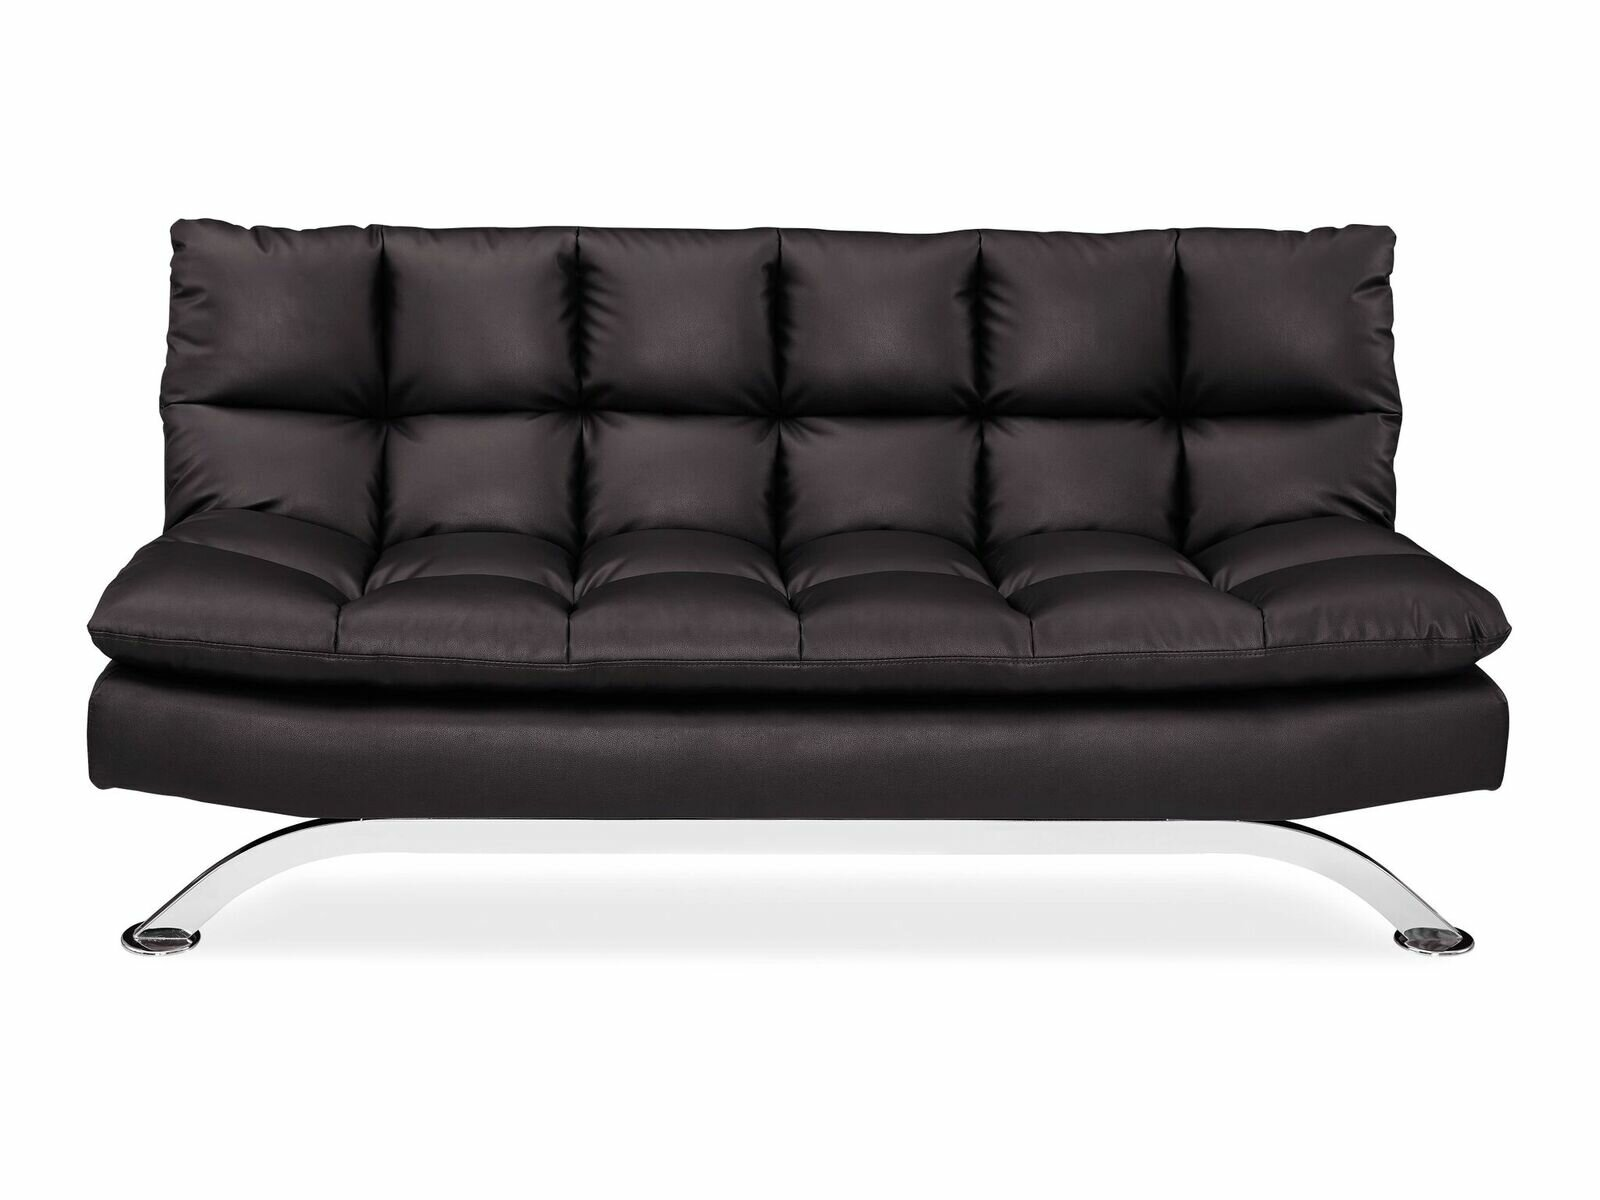 Details about Orren Ellis Waut Pillow Top Convertible Sofa